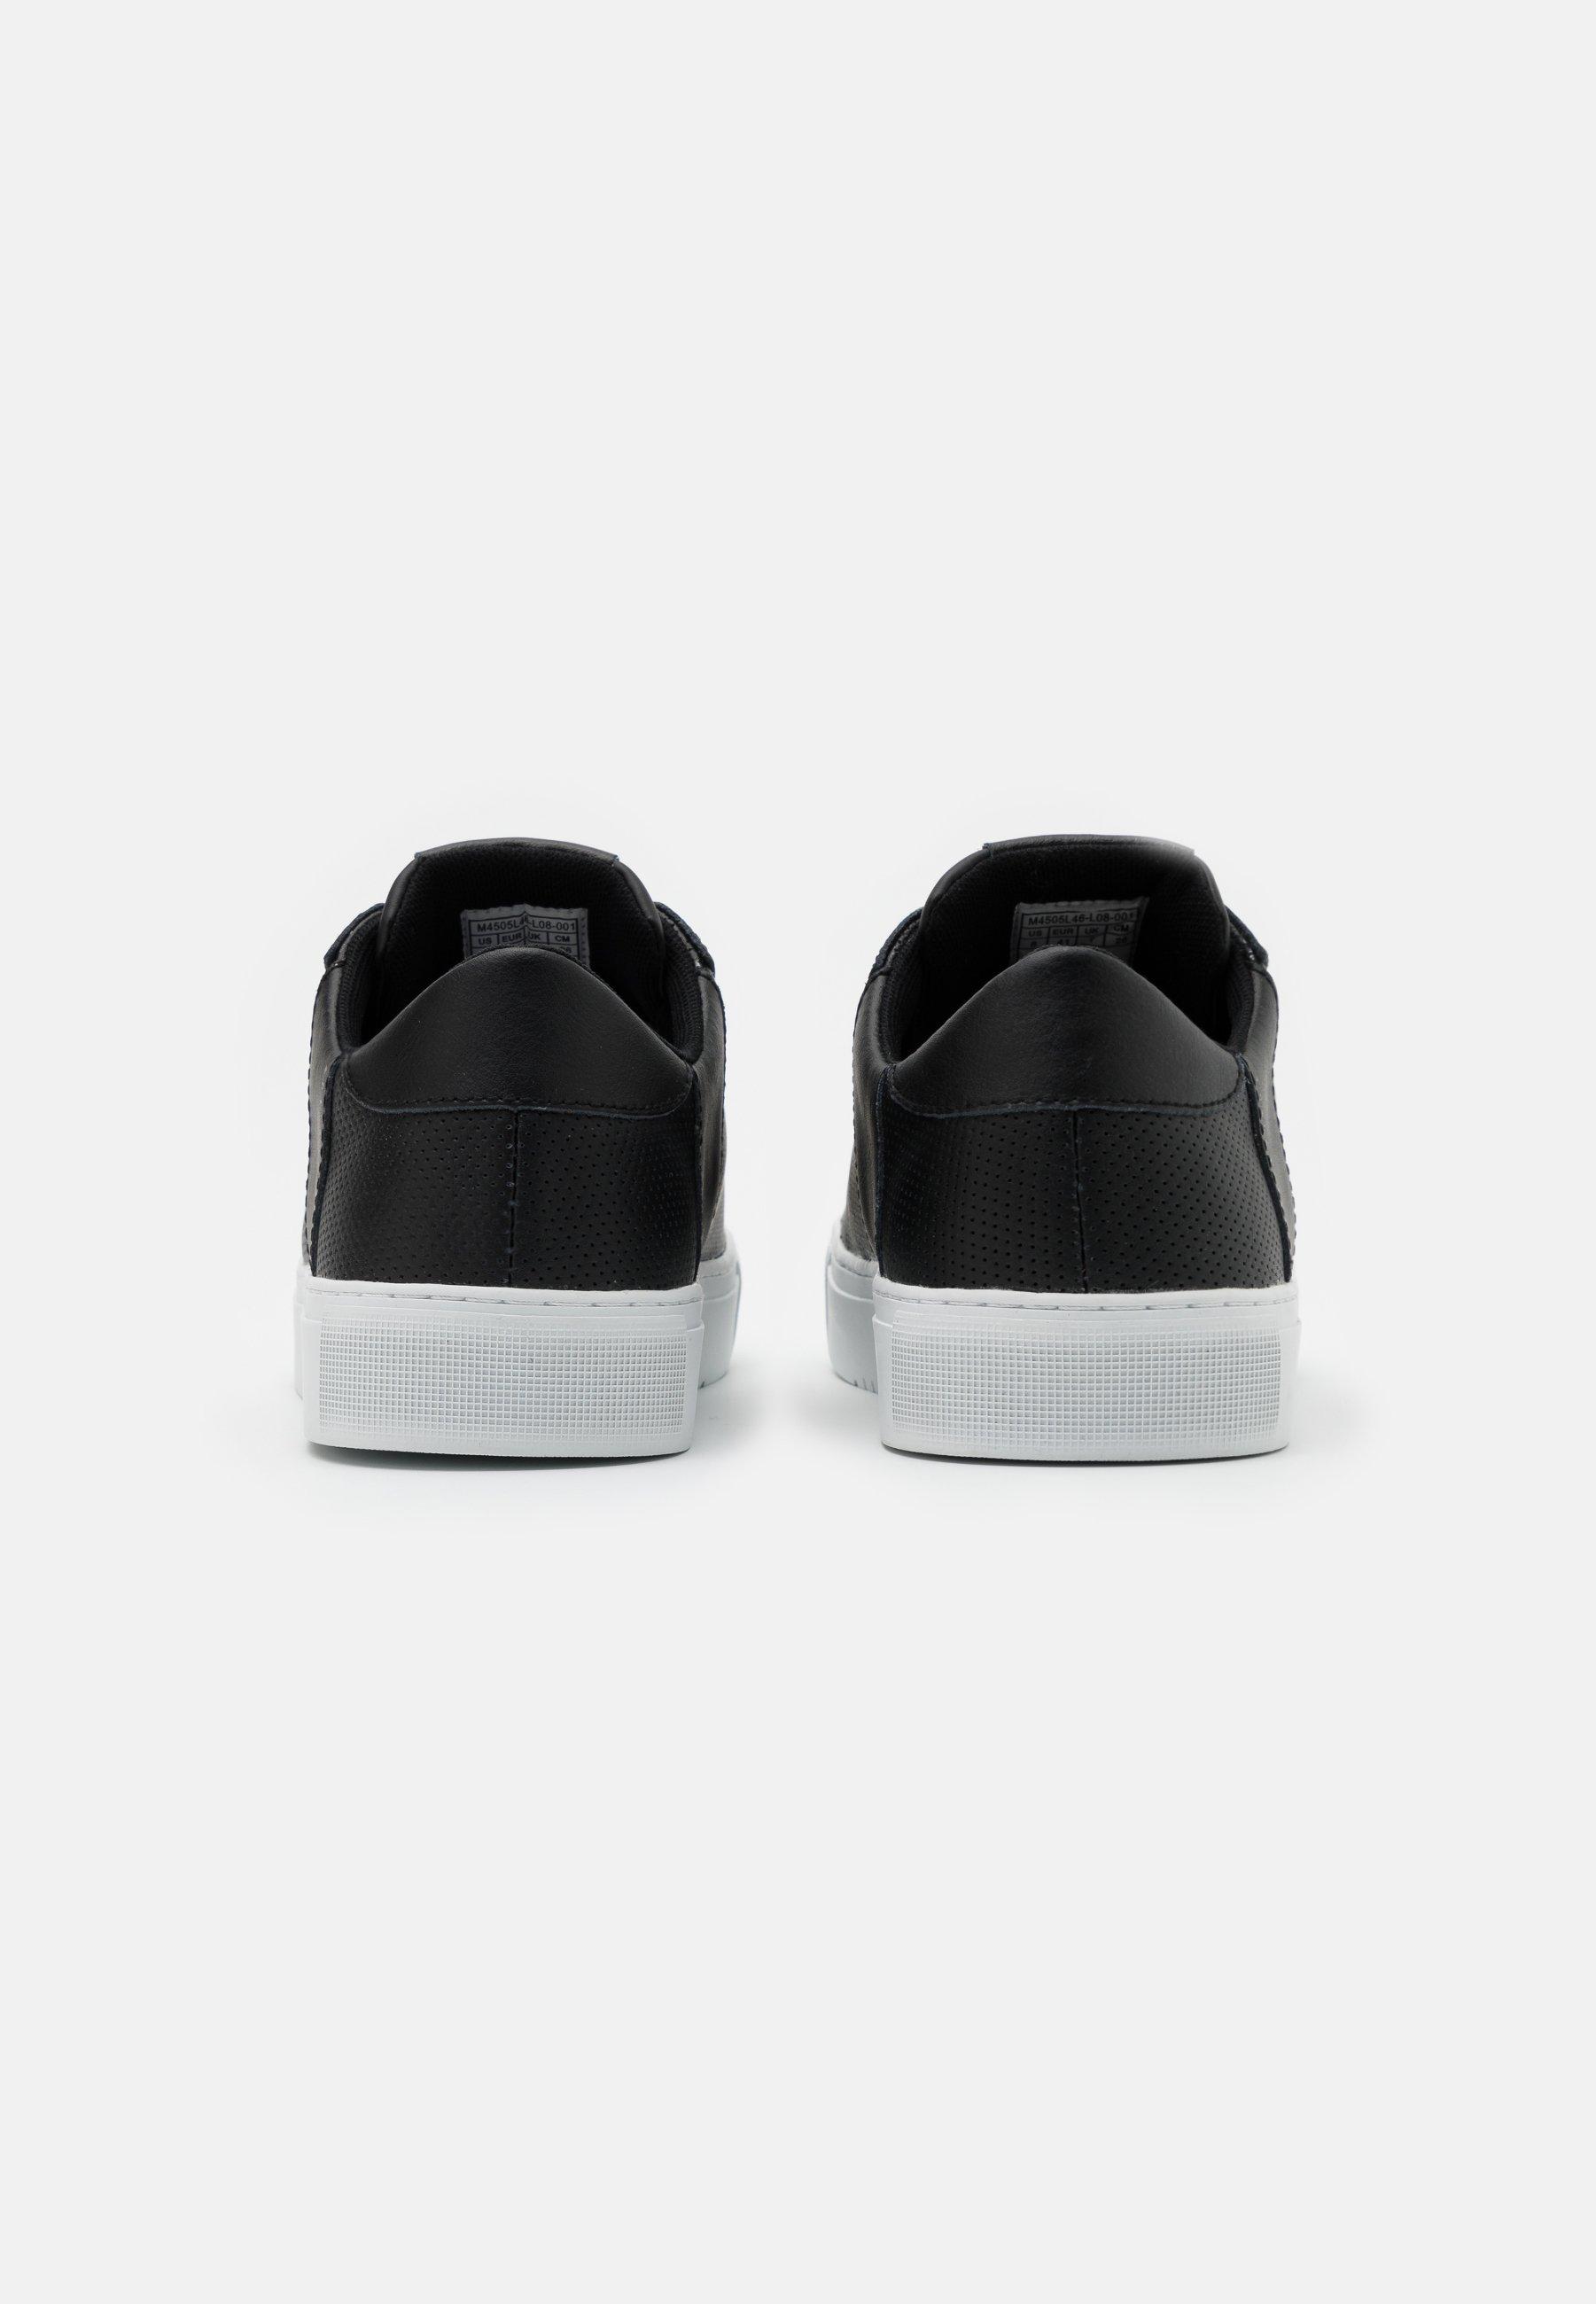 HUB HOOK - Sneaker low - black/white/schwarz - Herrenschuhe a6iW8